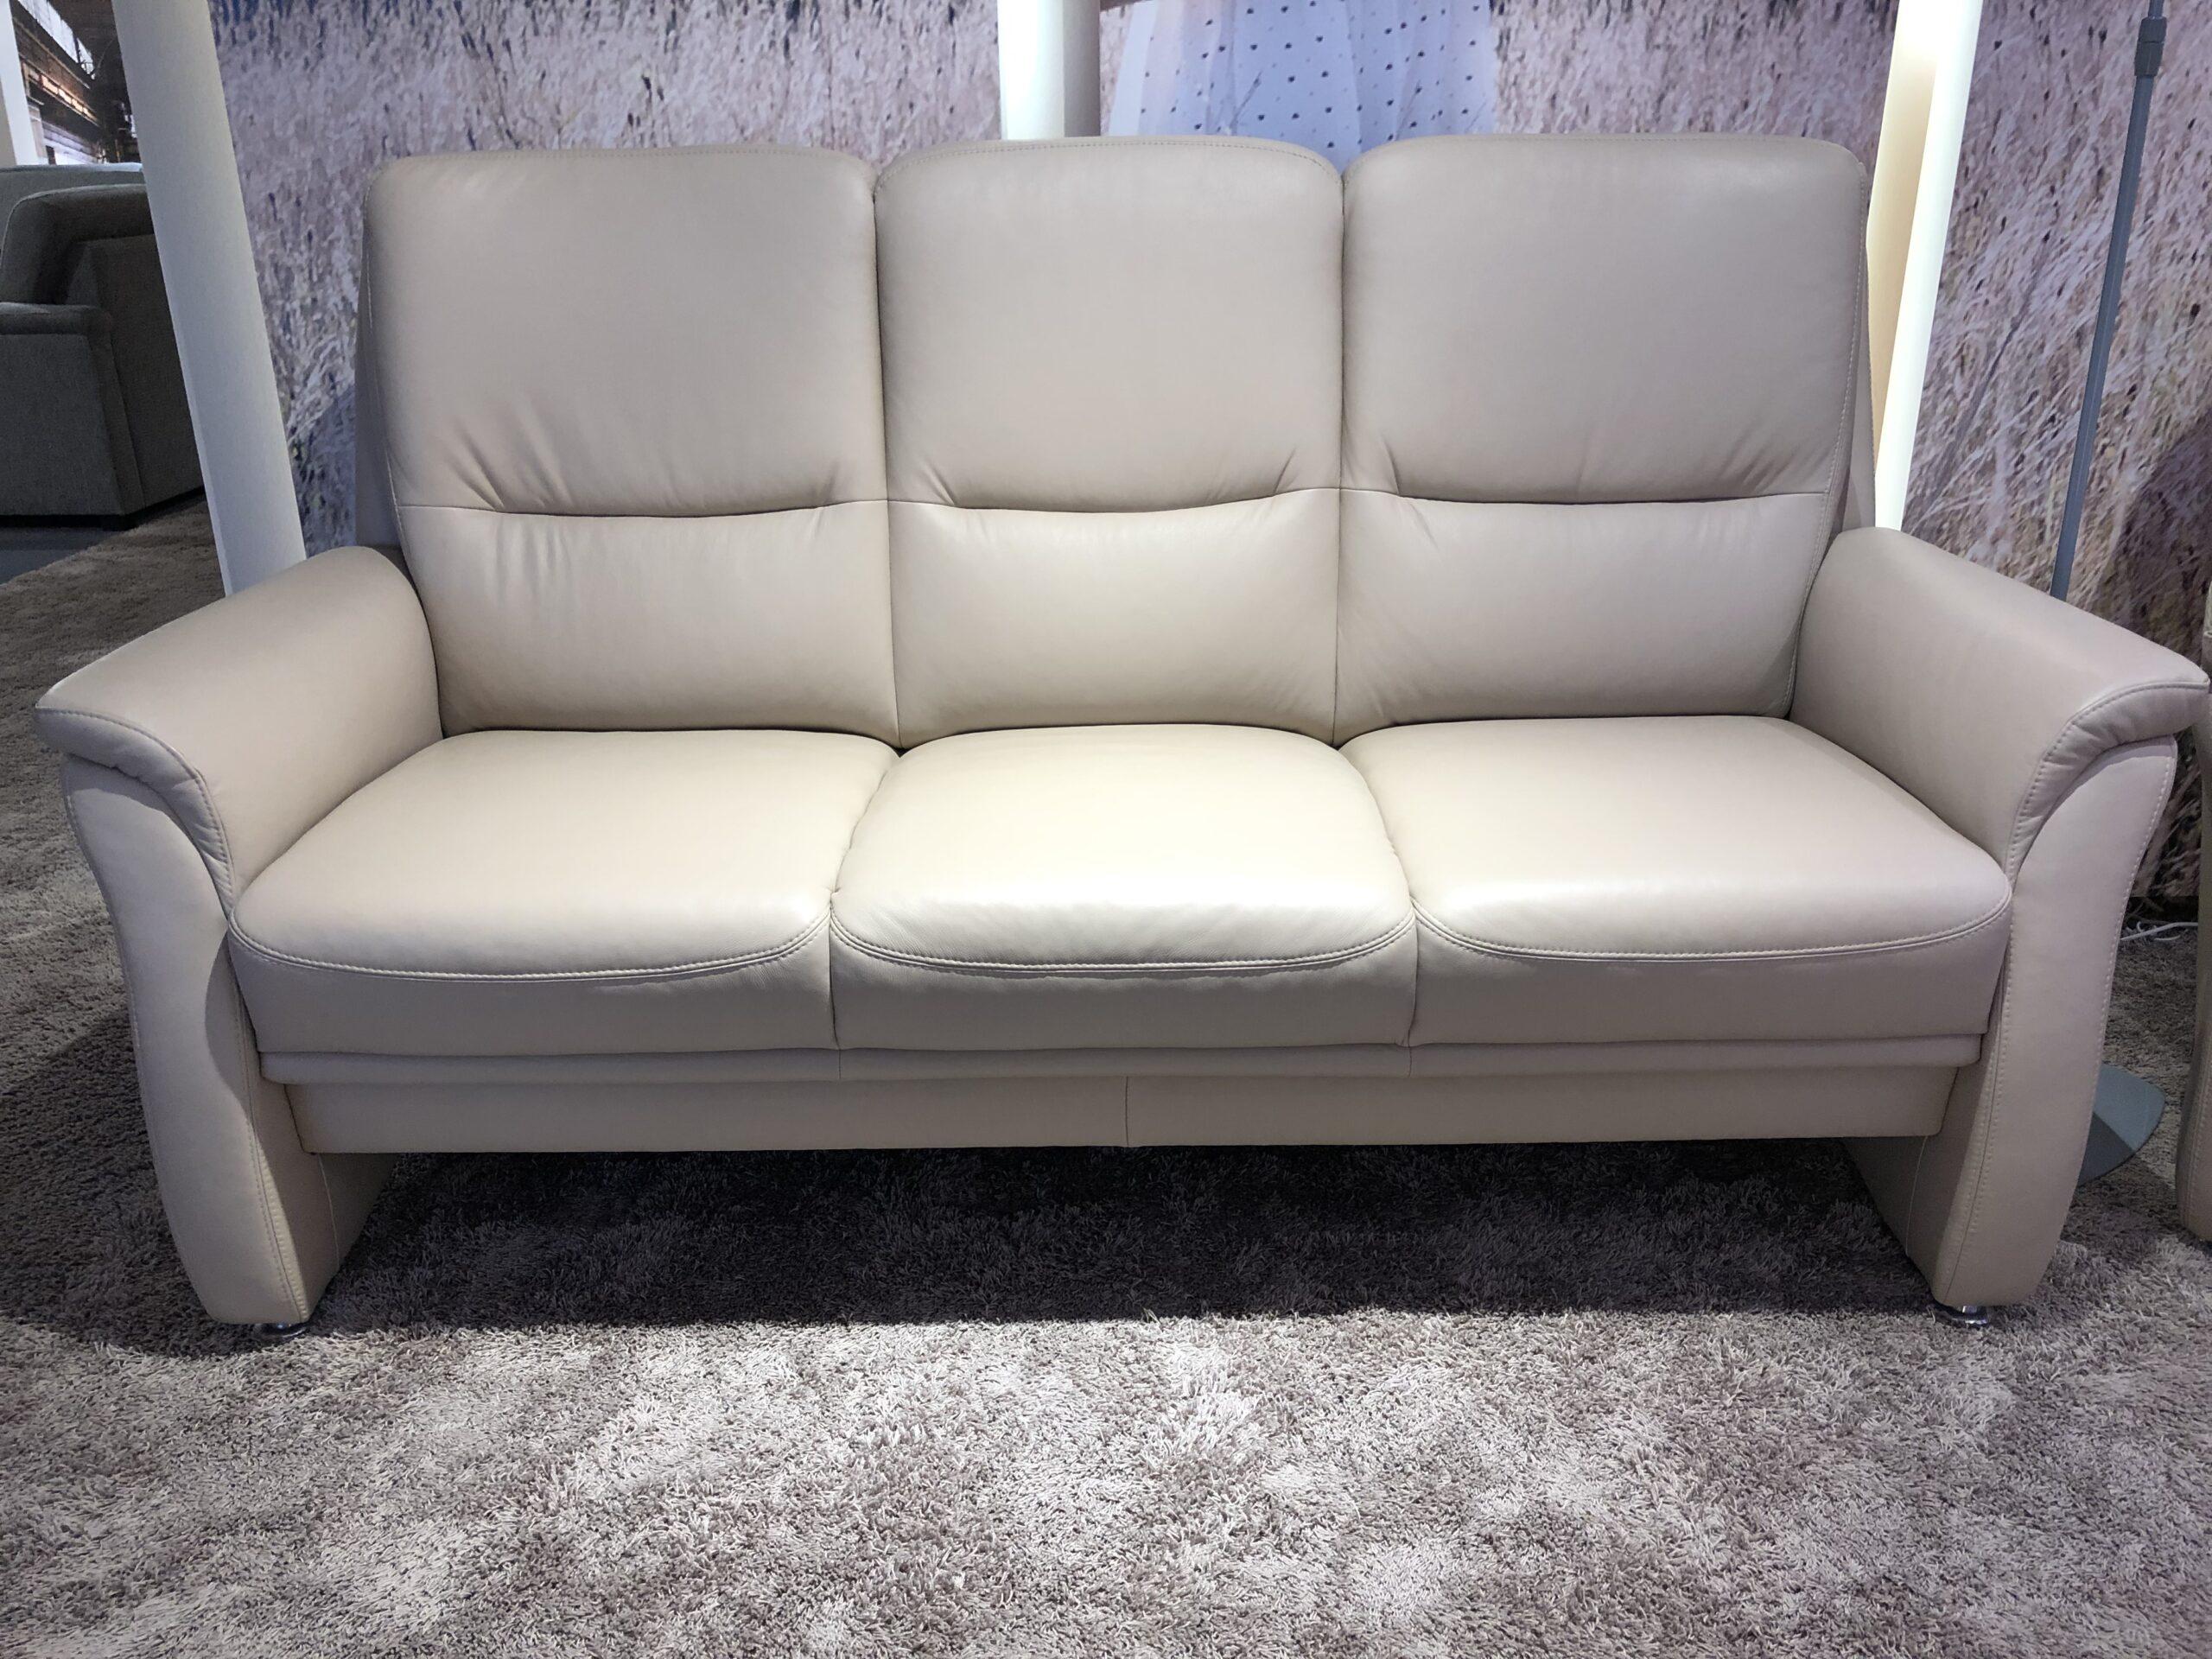 Full Size of Natura Sofa Brooklyn Kansas Denver Couch Mit Hocker 2 Sitzer Boxspring Schlaffunktion Xxl Günstig Recamiere Federkern Schlafsofa Liegefläche 160x200 Grün Sofa Natura Sofa